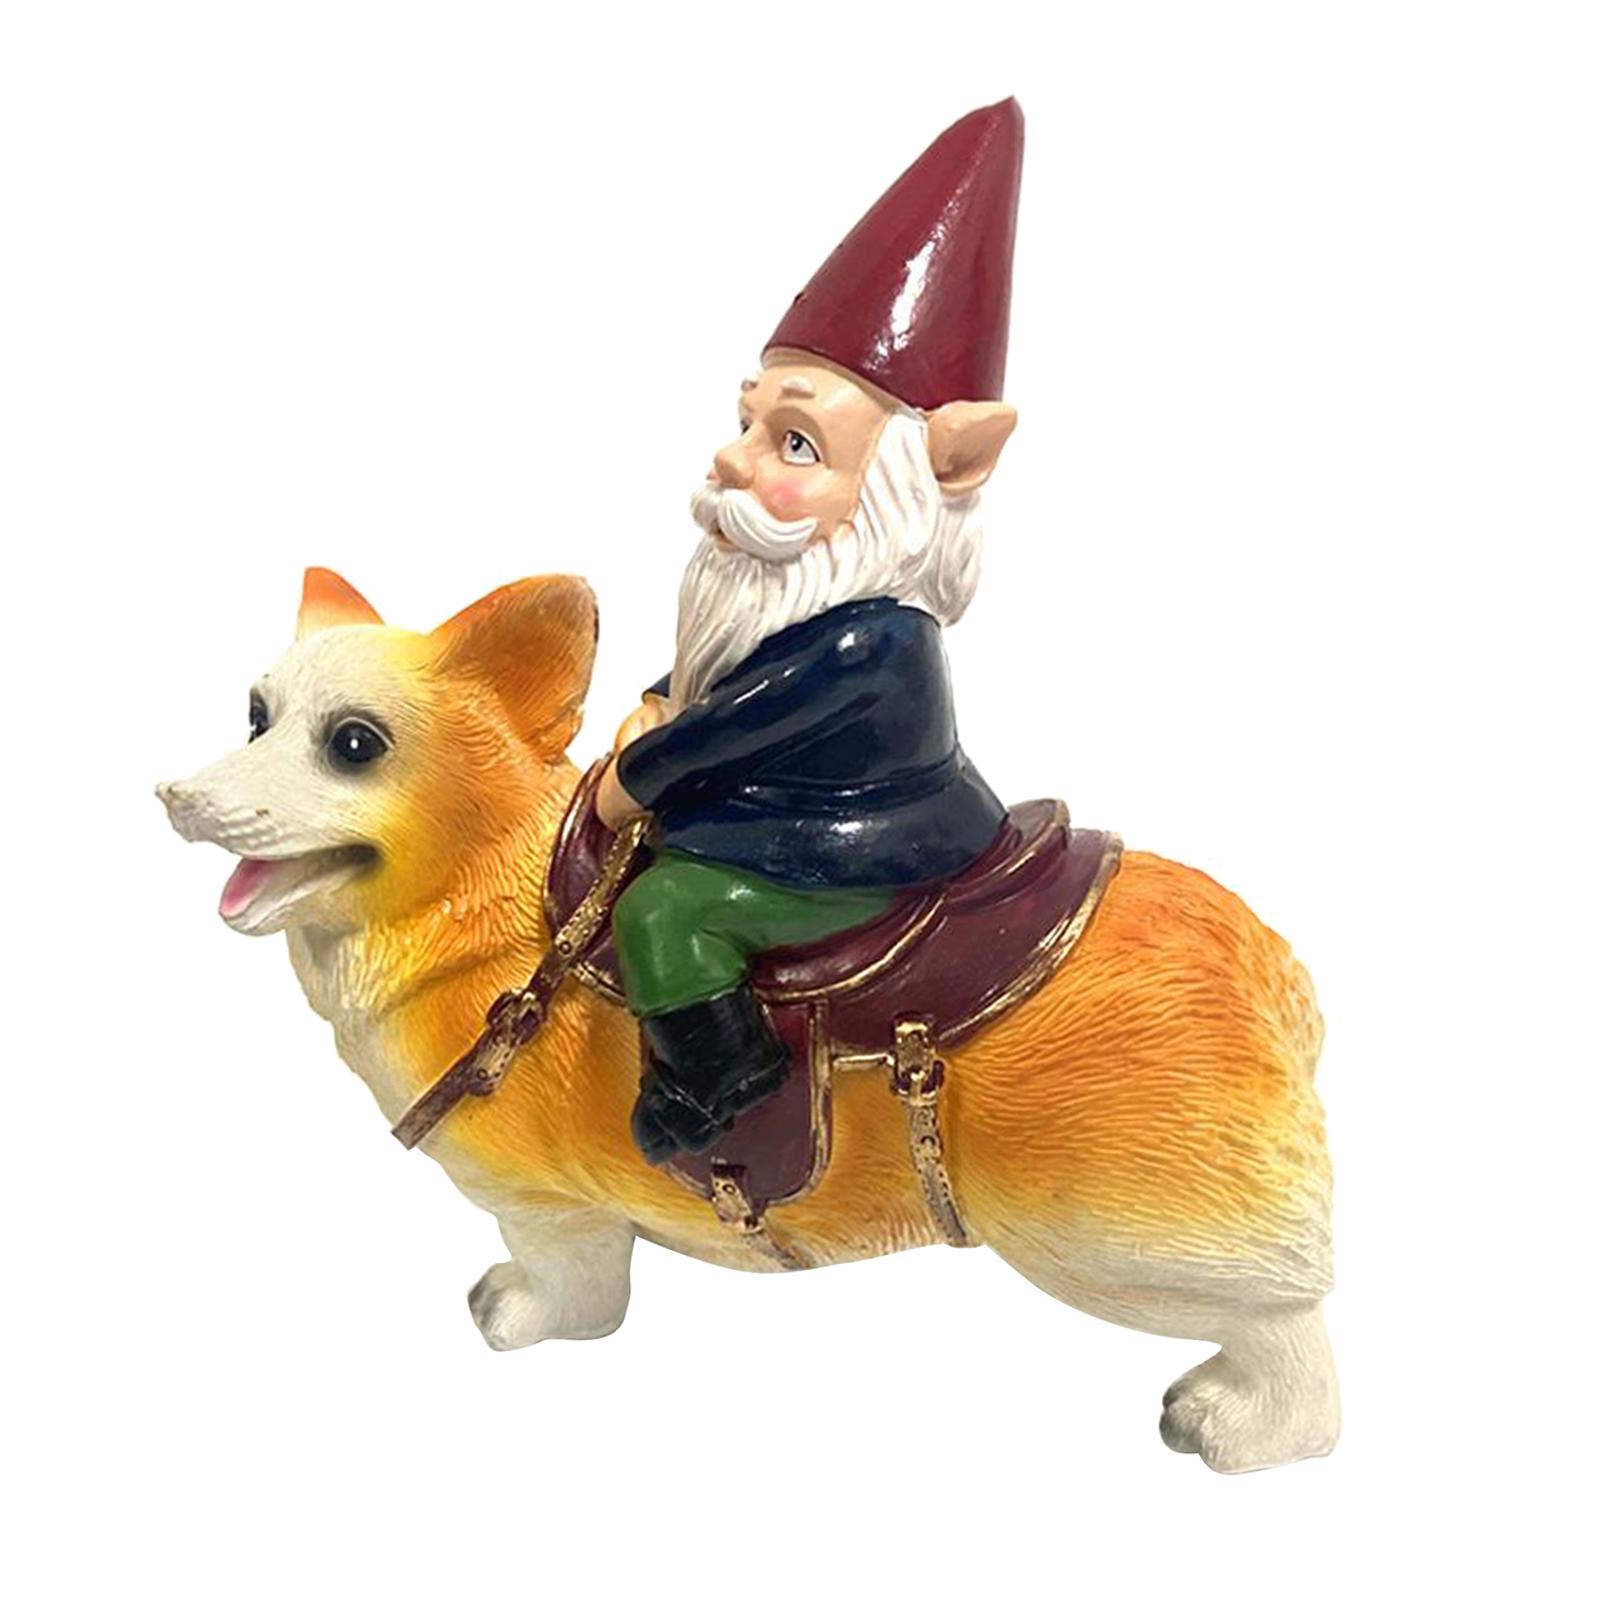 thumbnail 31 - Funny Resin Naughty Garden Gnome Statue Ornaments Villa Home Figurines Decor